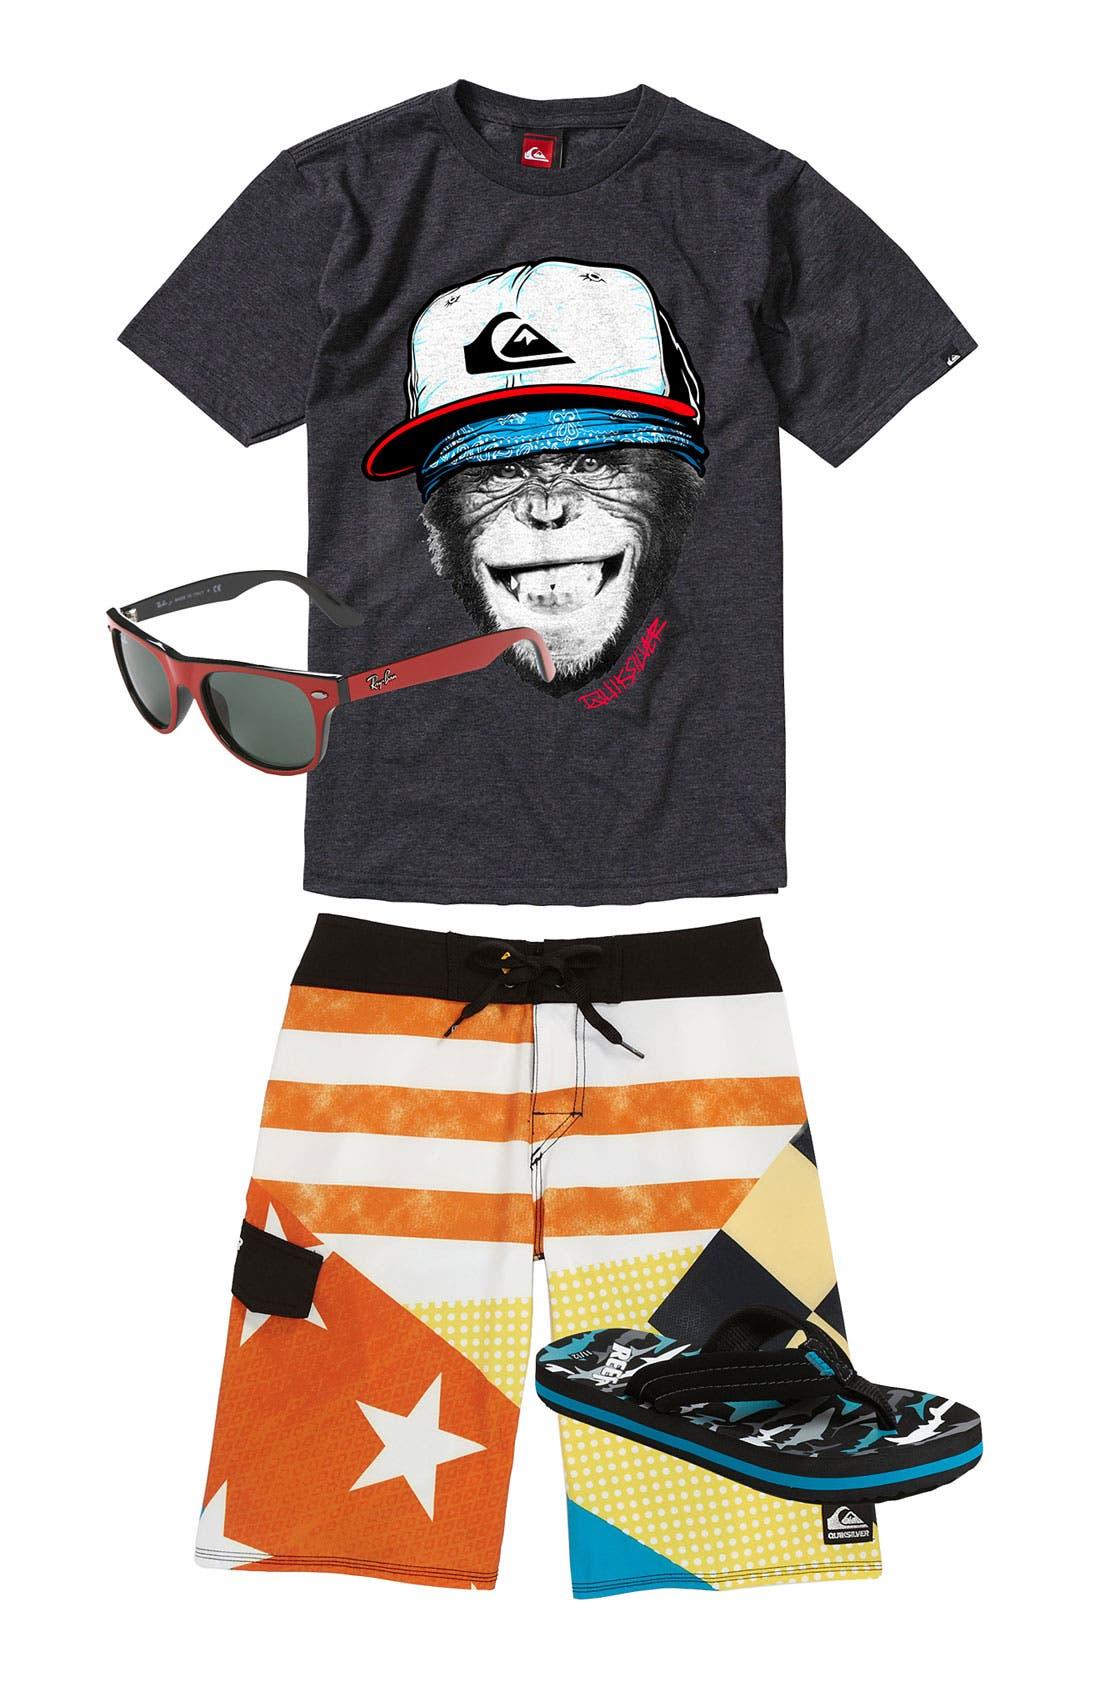 Alternate Image 1 Selected - Quiksilver T-Shirt & Board Shorts & Ray-Ban Sunglasses (Big Boys)